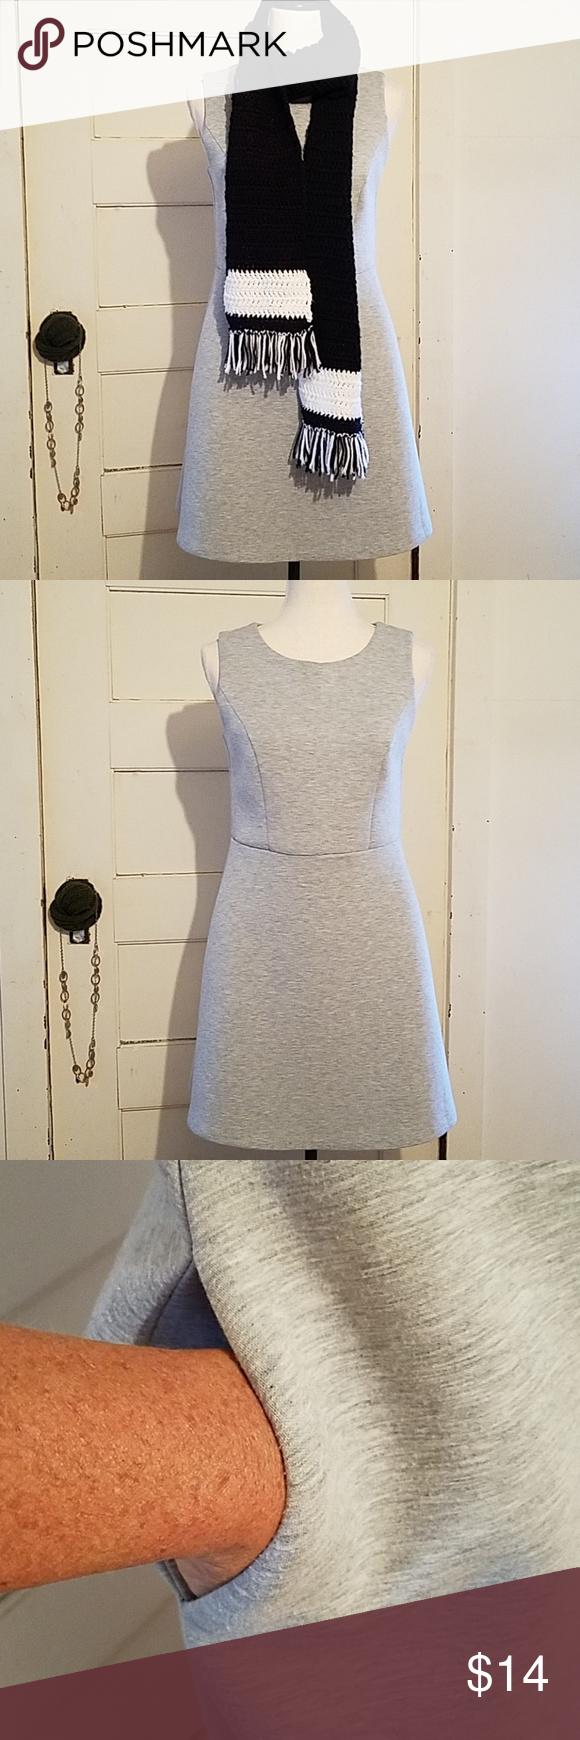 Paraphrase Sleeveles Thick Midi Dres Heatherd Gray Outside Cozy Polyester Rayon Spandex Material Size 6 Skater S Dresse Sleeveless Grey Dress